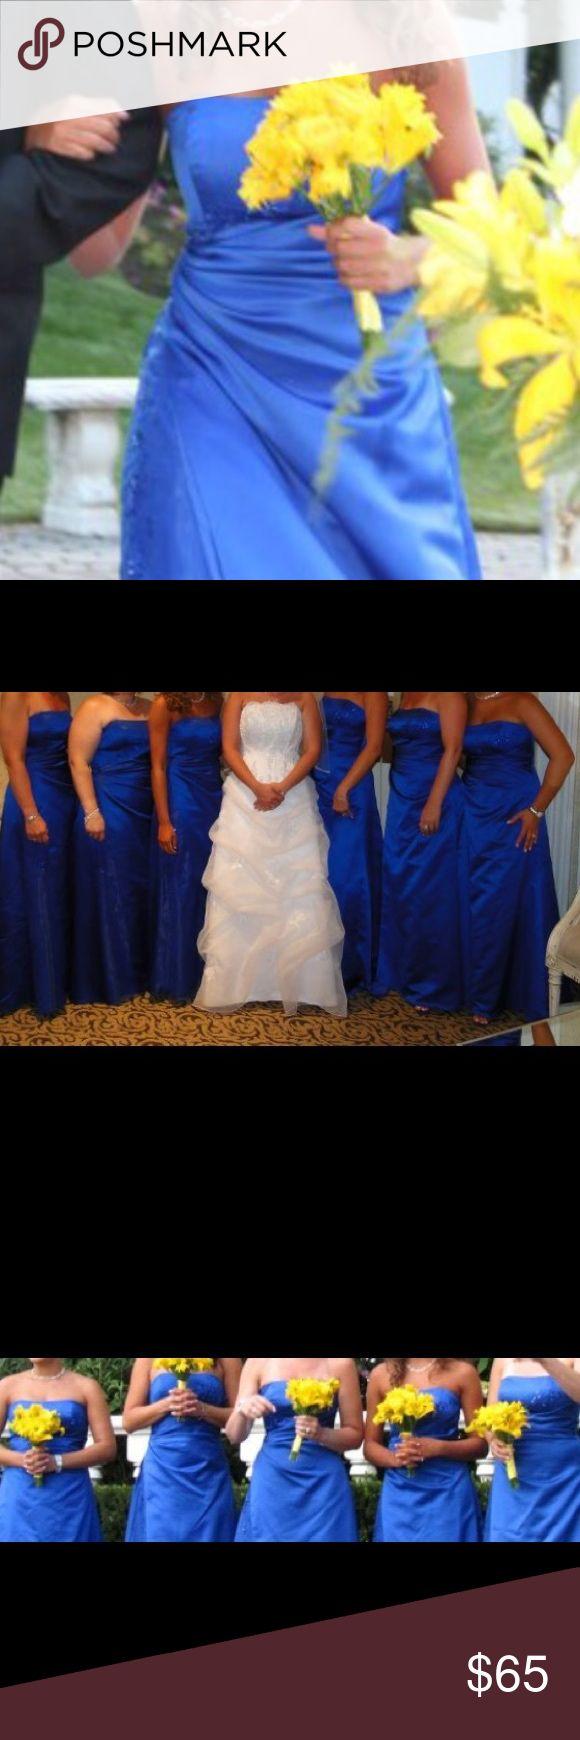 Prom dress / bridesmaid dress Strapless dress for sale. David's bridal. Size 2. Worn once. Smoke free home. David's Bridal Dresses Wedding